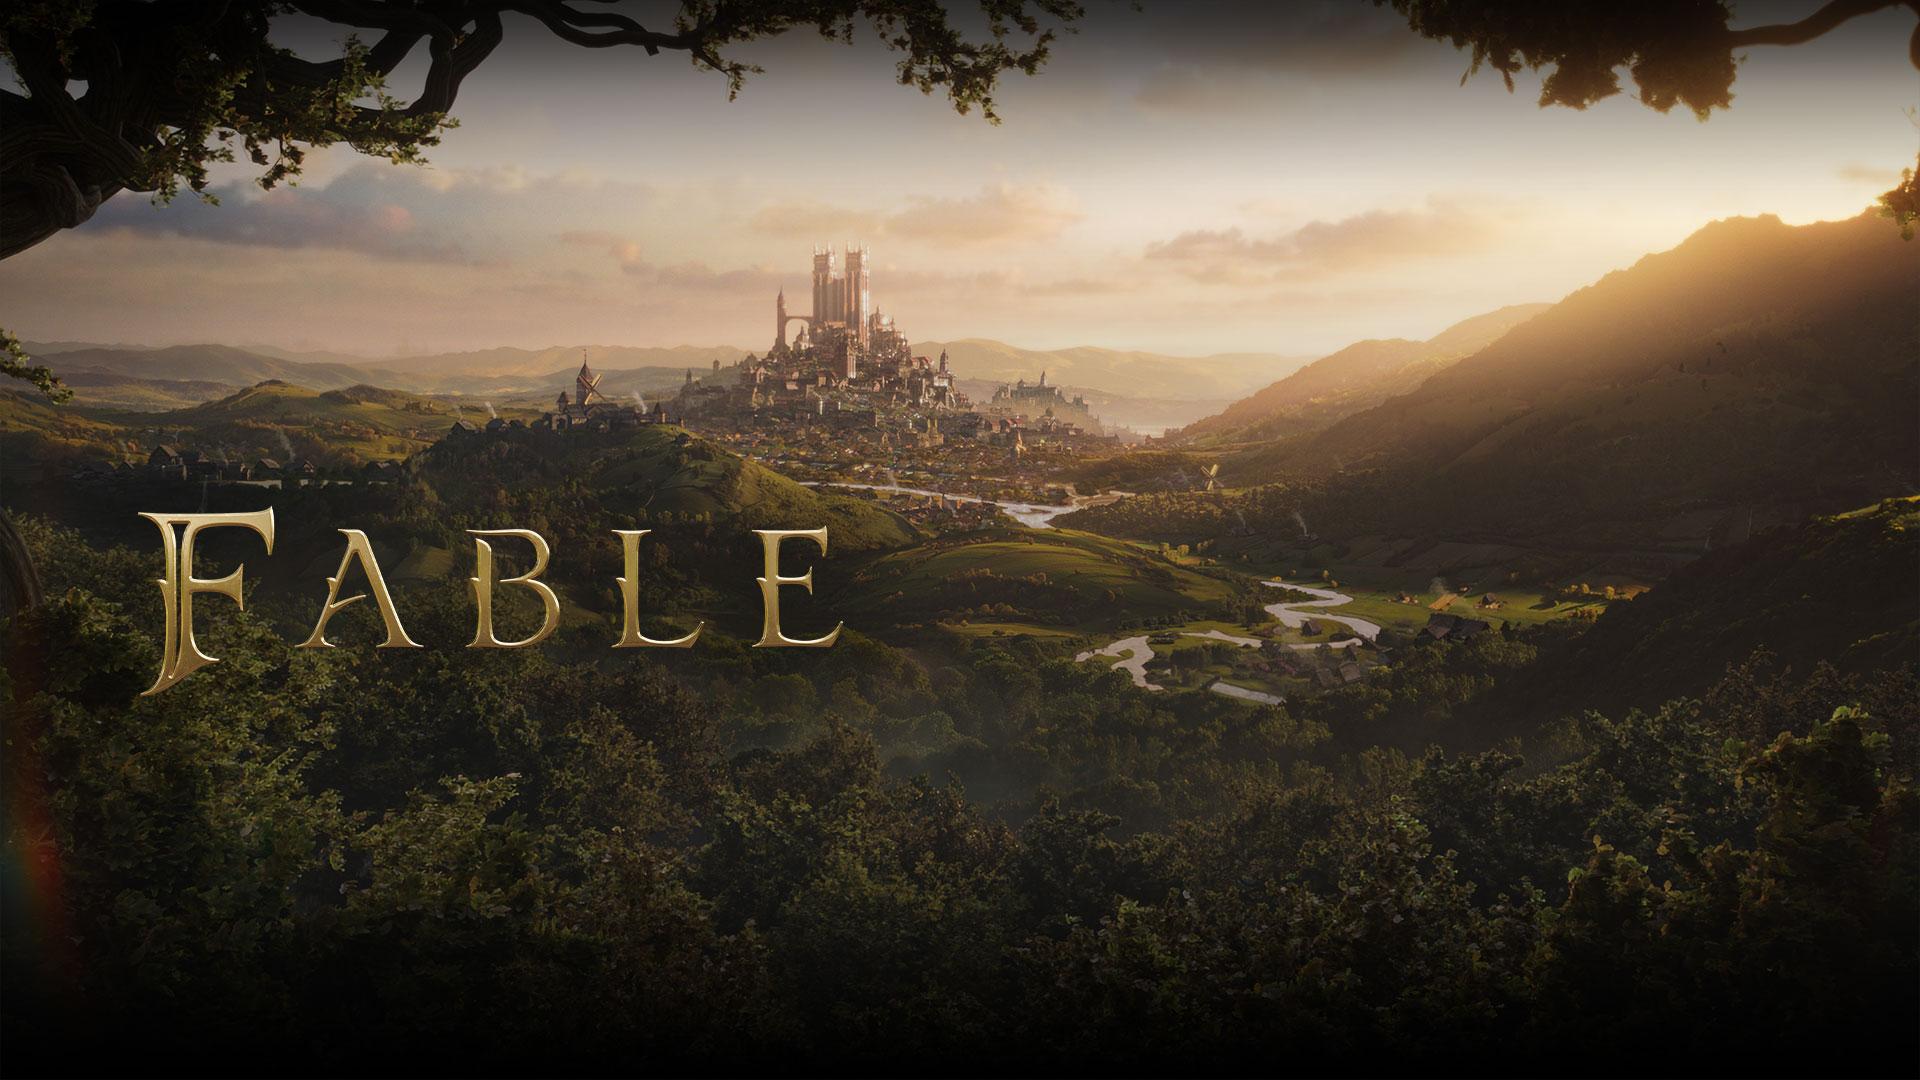 Fable,一座經過森林和山谷的城市